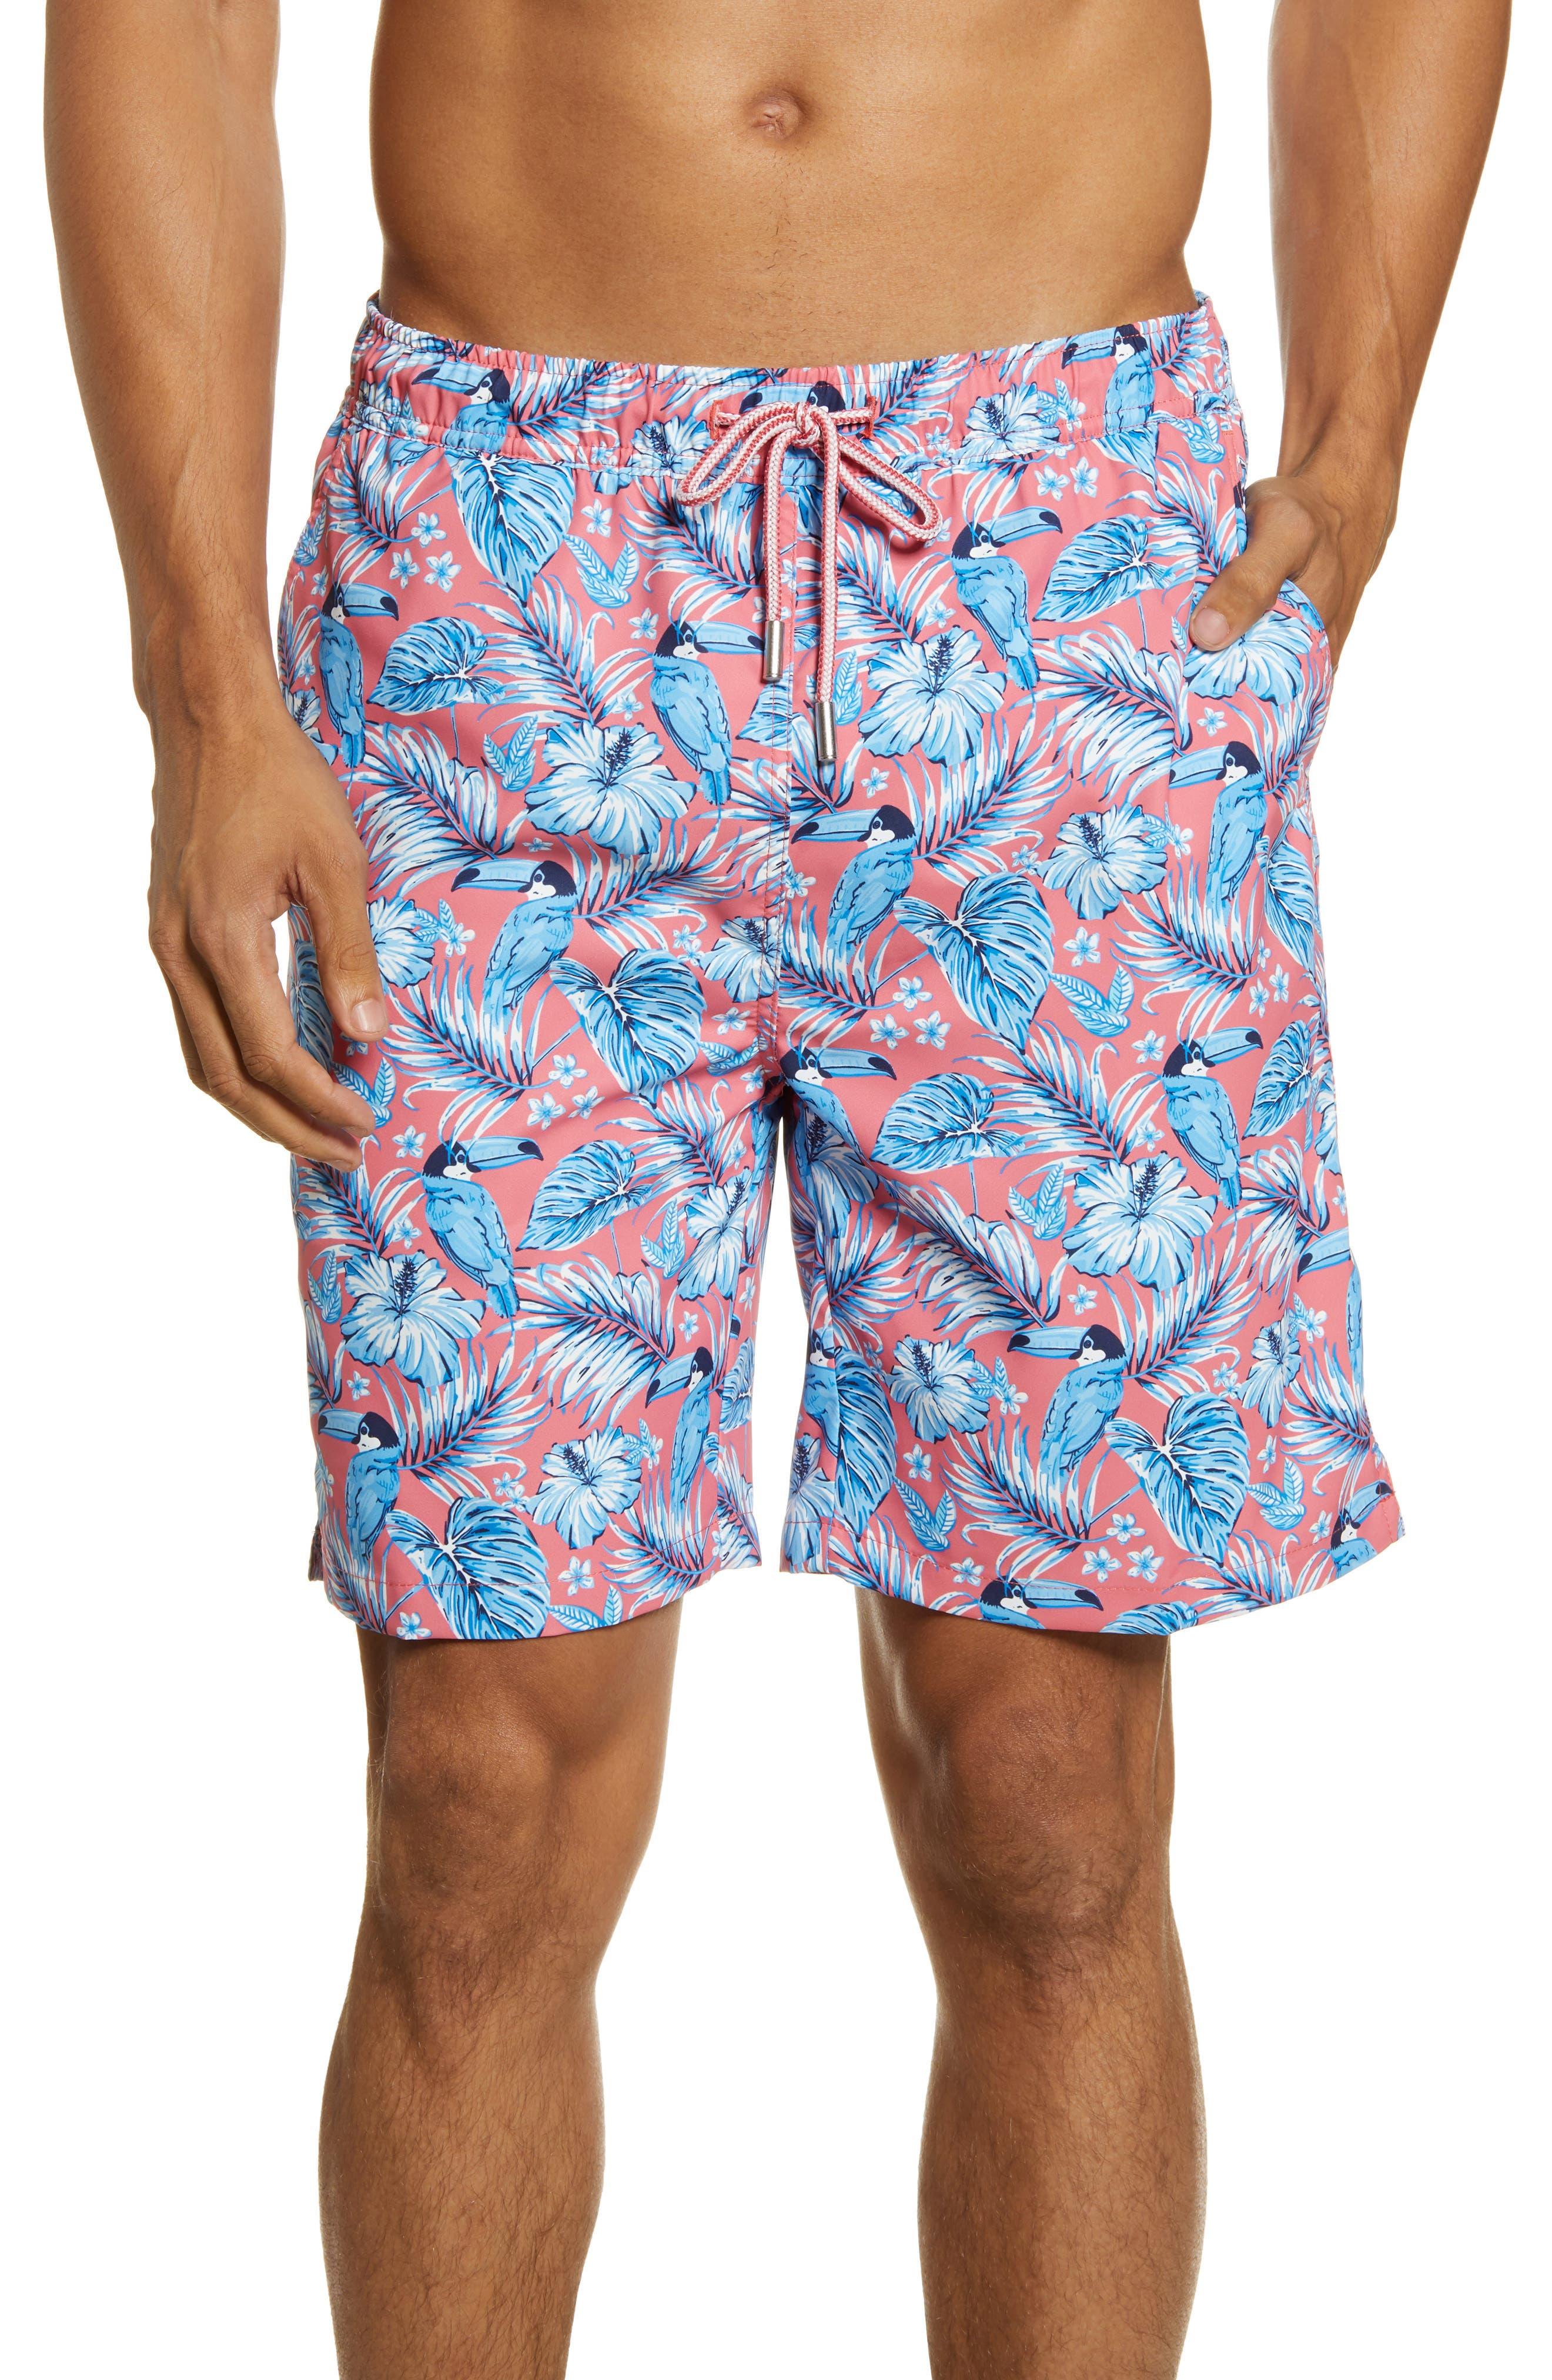 Image of Peter Millar Toucanopy Tropical Swim Trunks